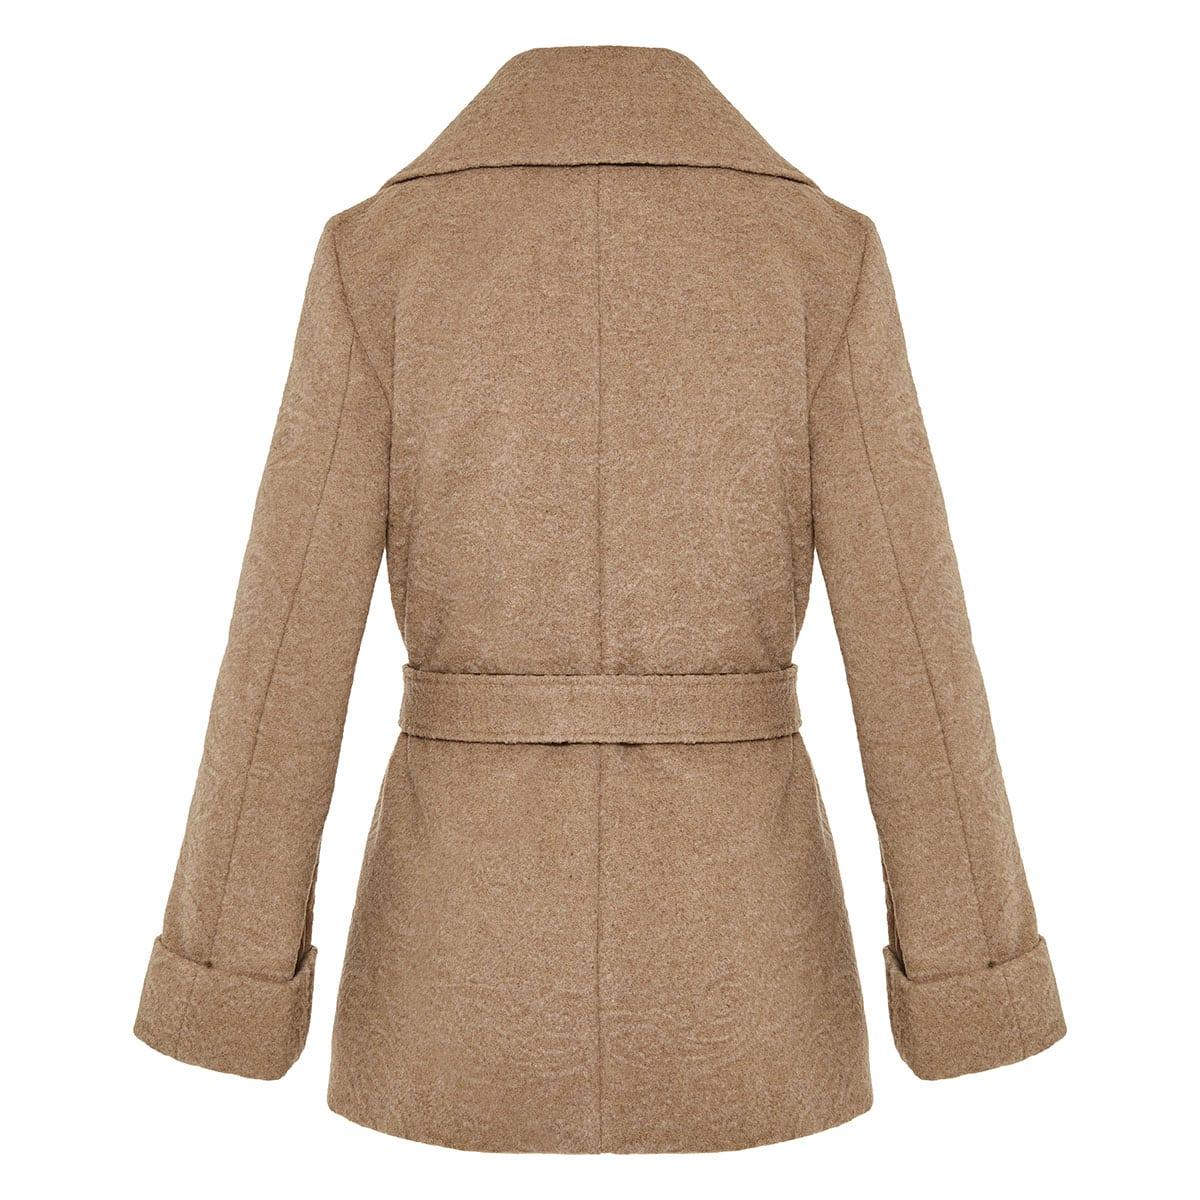 Belted jacquard wool coat